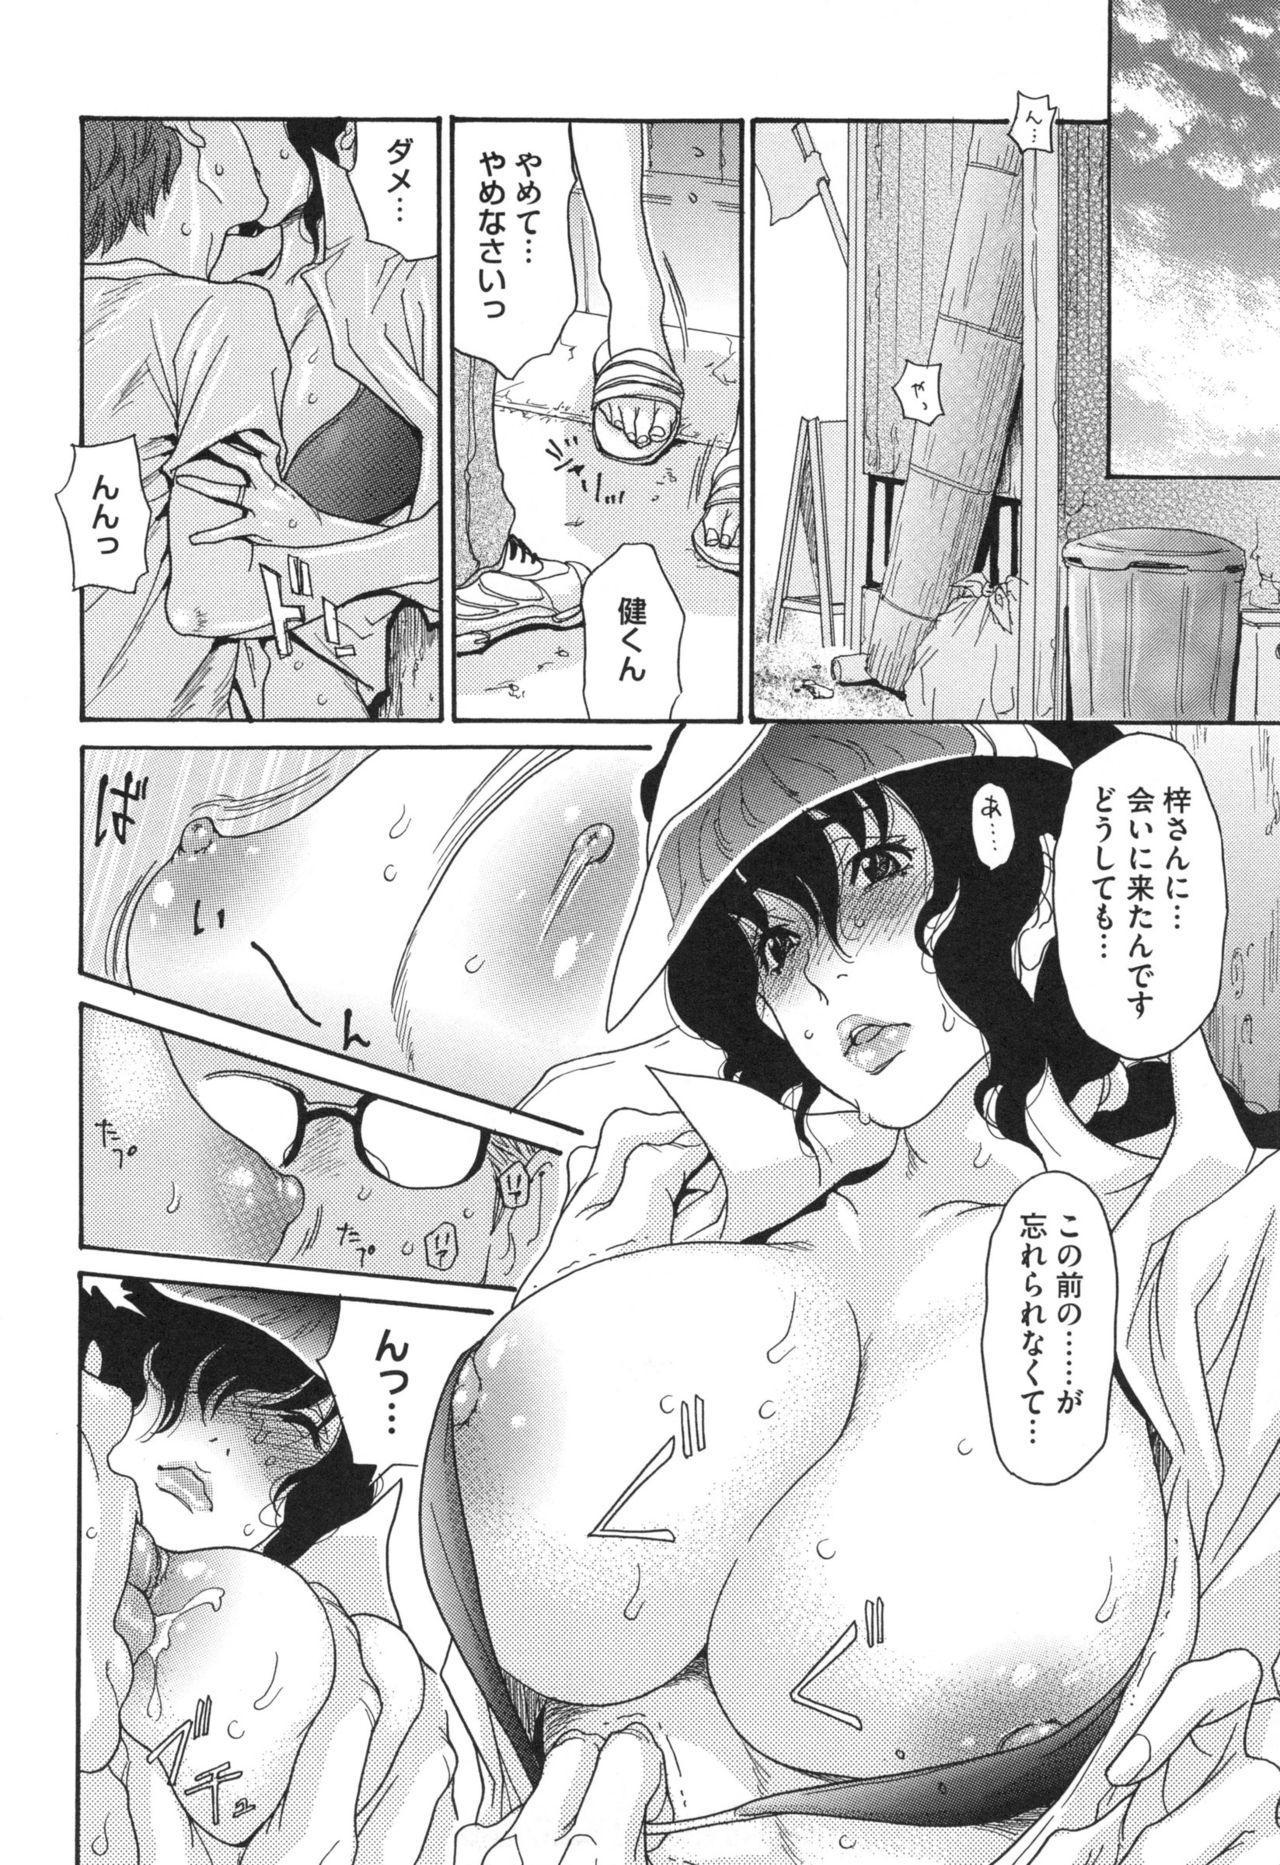 Niku-zuma Netorare Maniacs 98